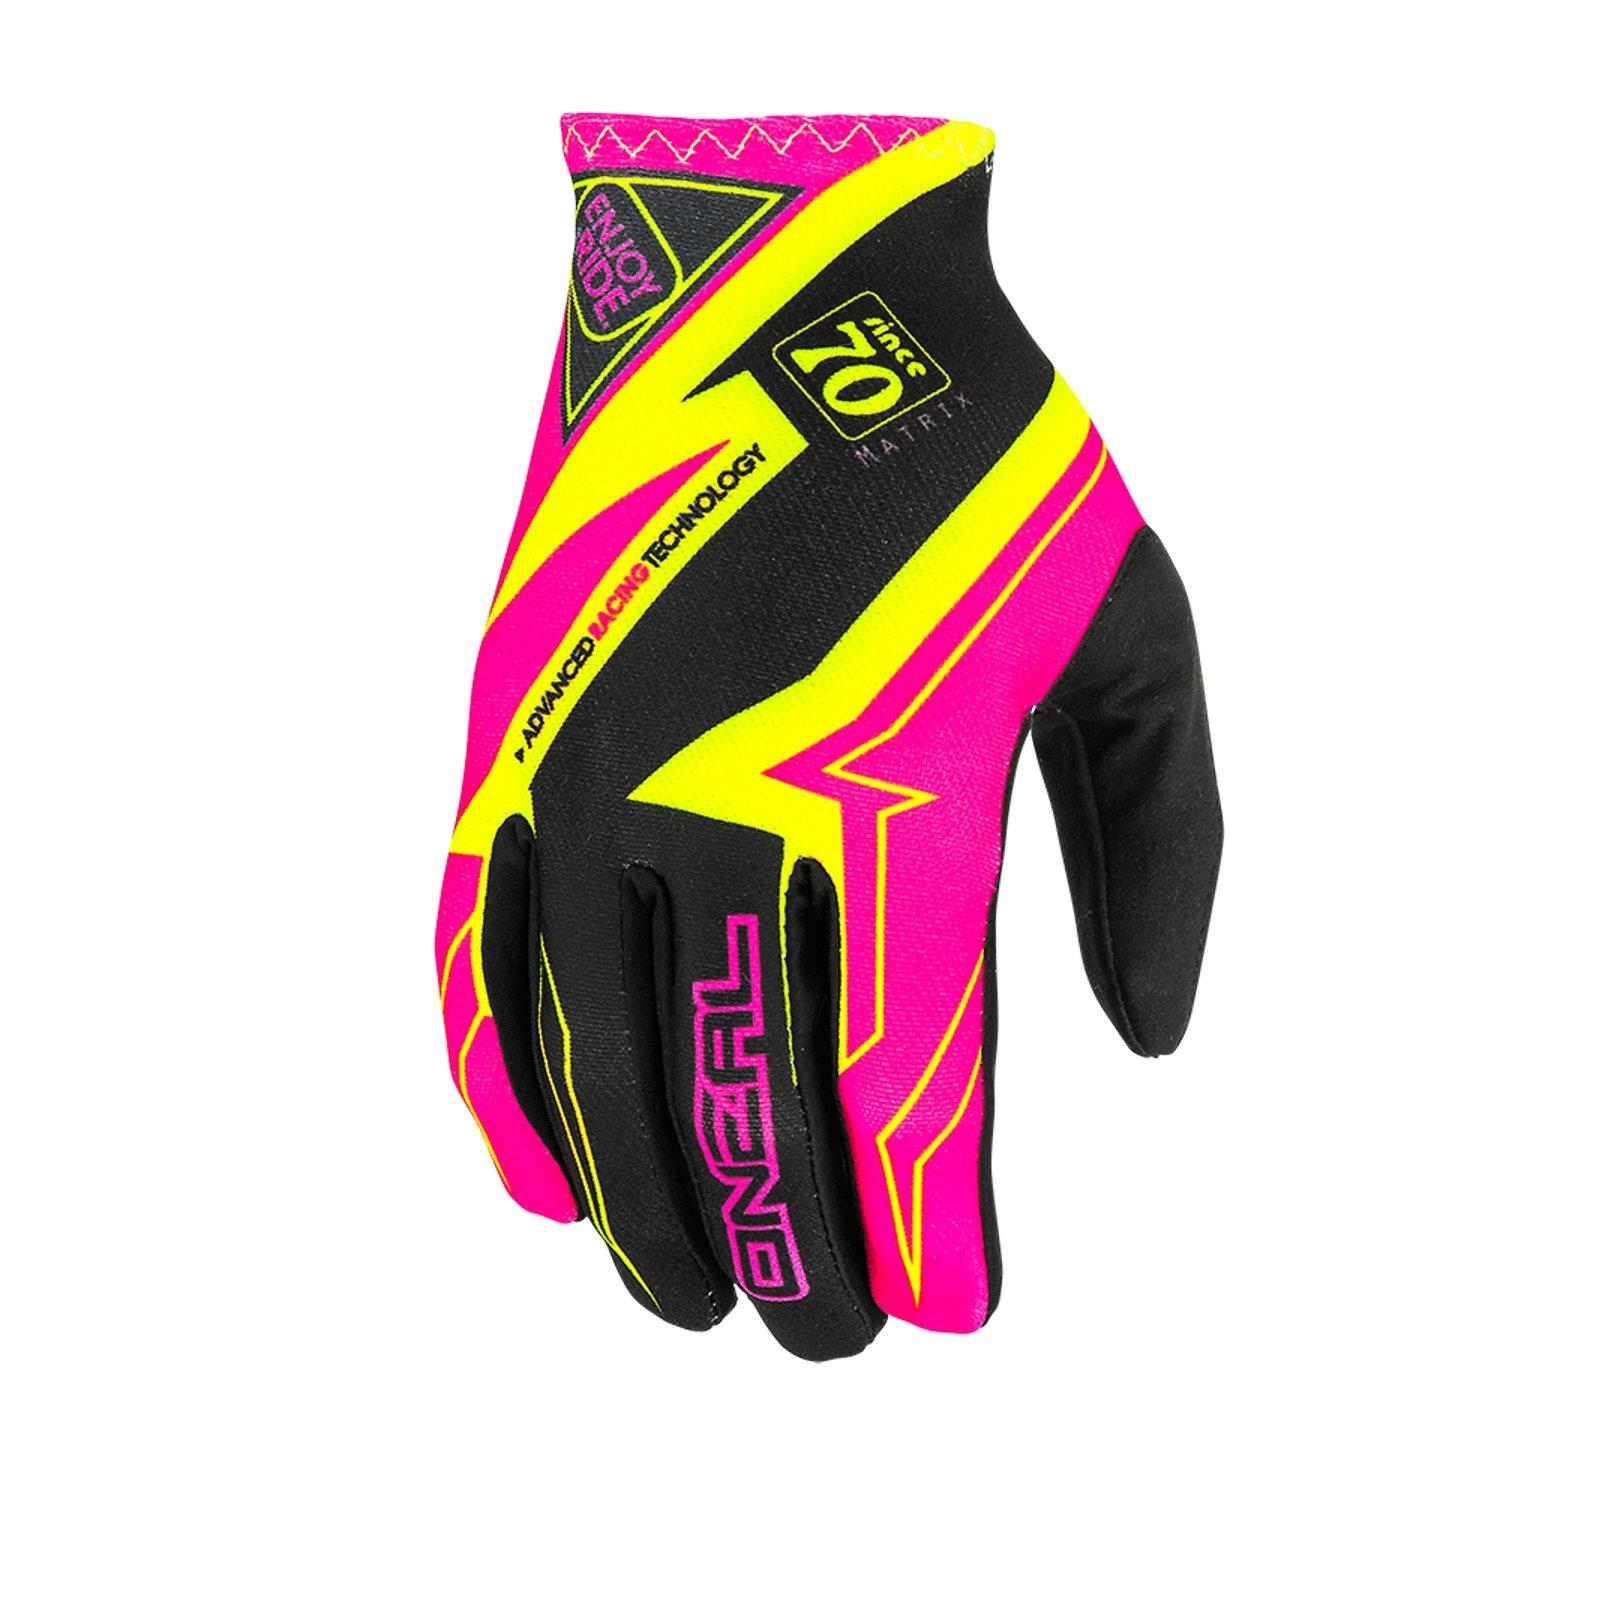 ONEAL Matrix MX Guanti Racewear Rosa MOTO CROSS MTB MX DOWNHILL MOUNTAIN BIKE